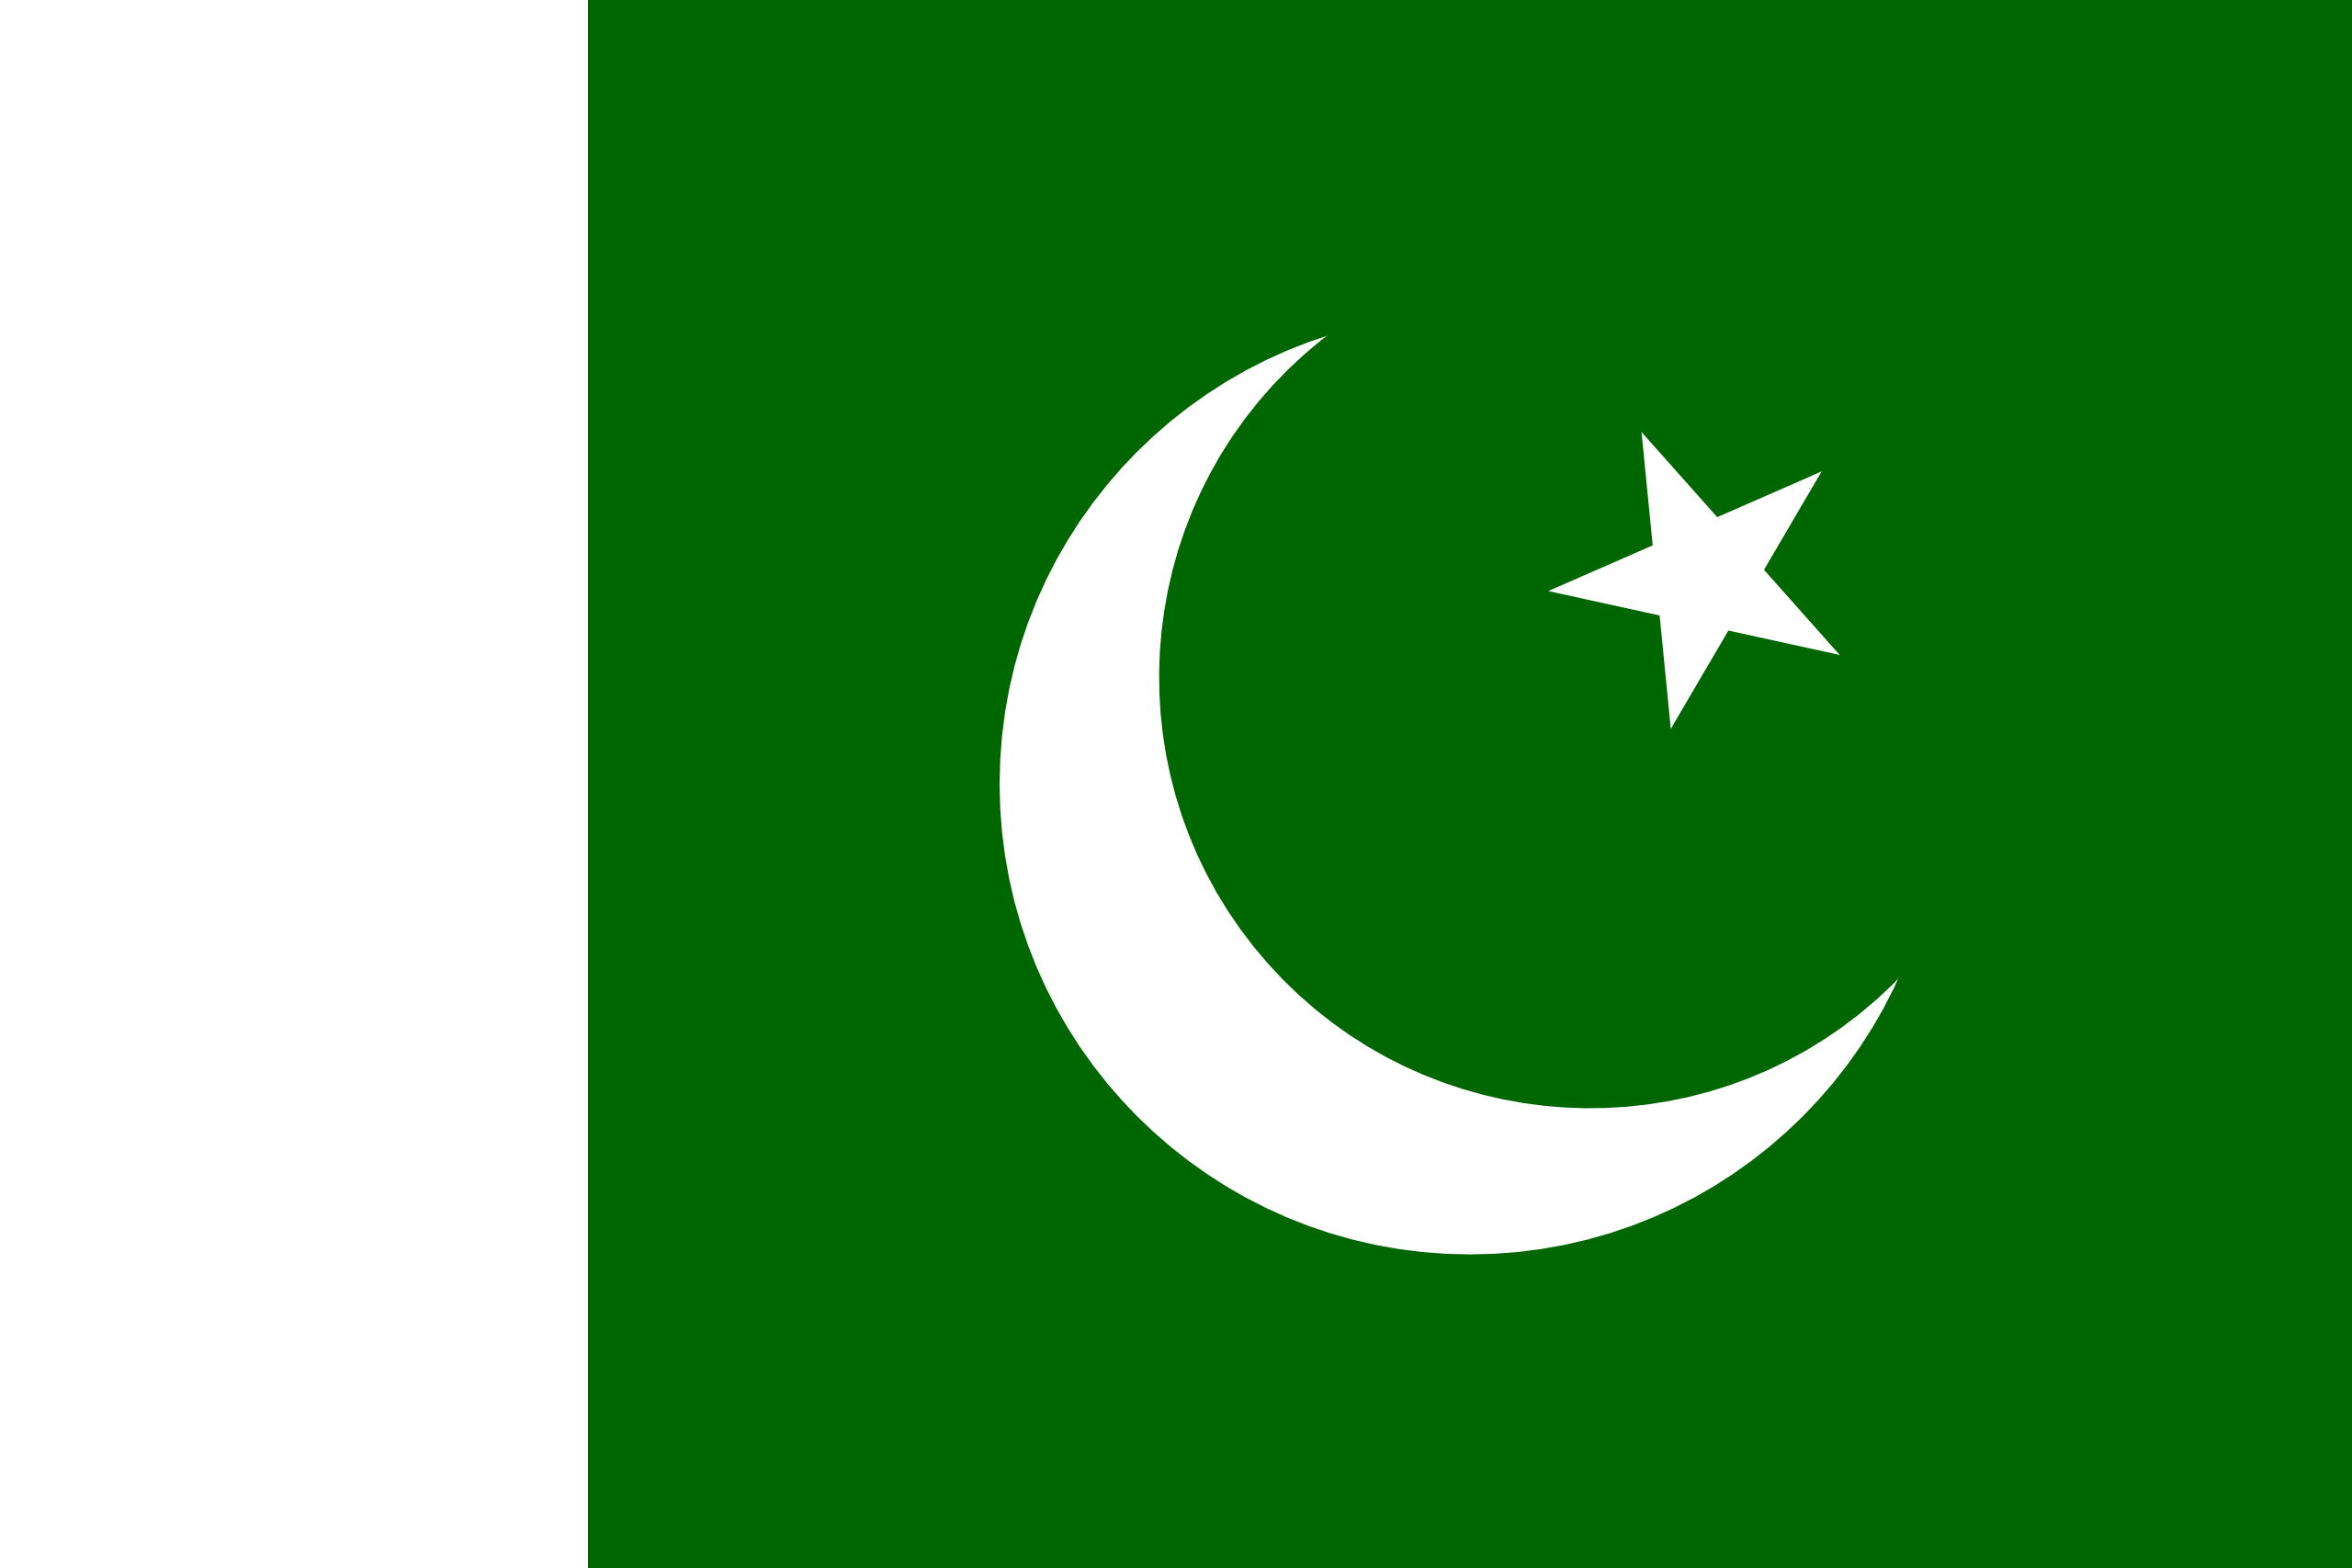 Pakistán-ley-identidad-otdchile